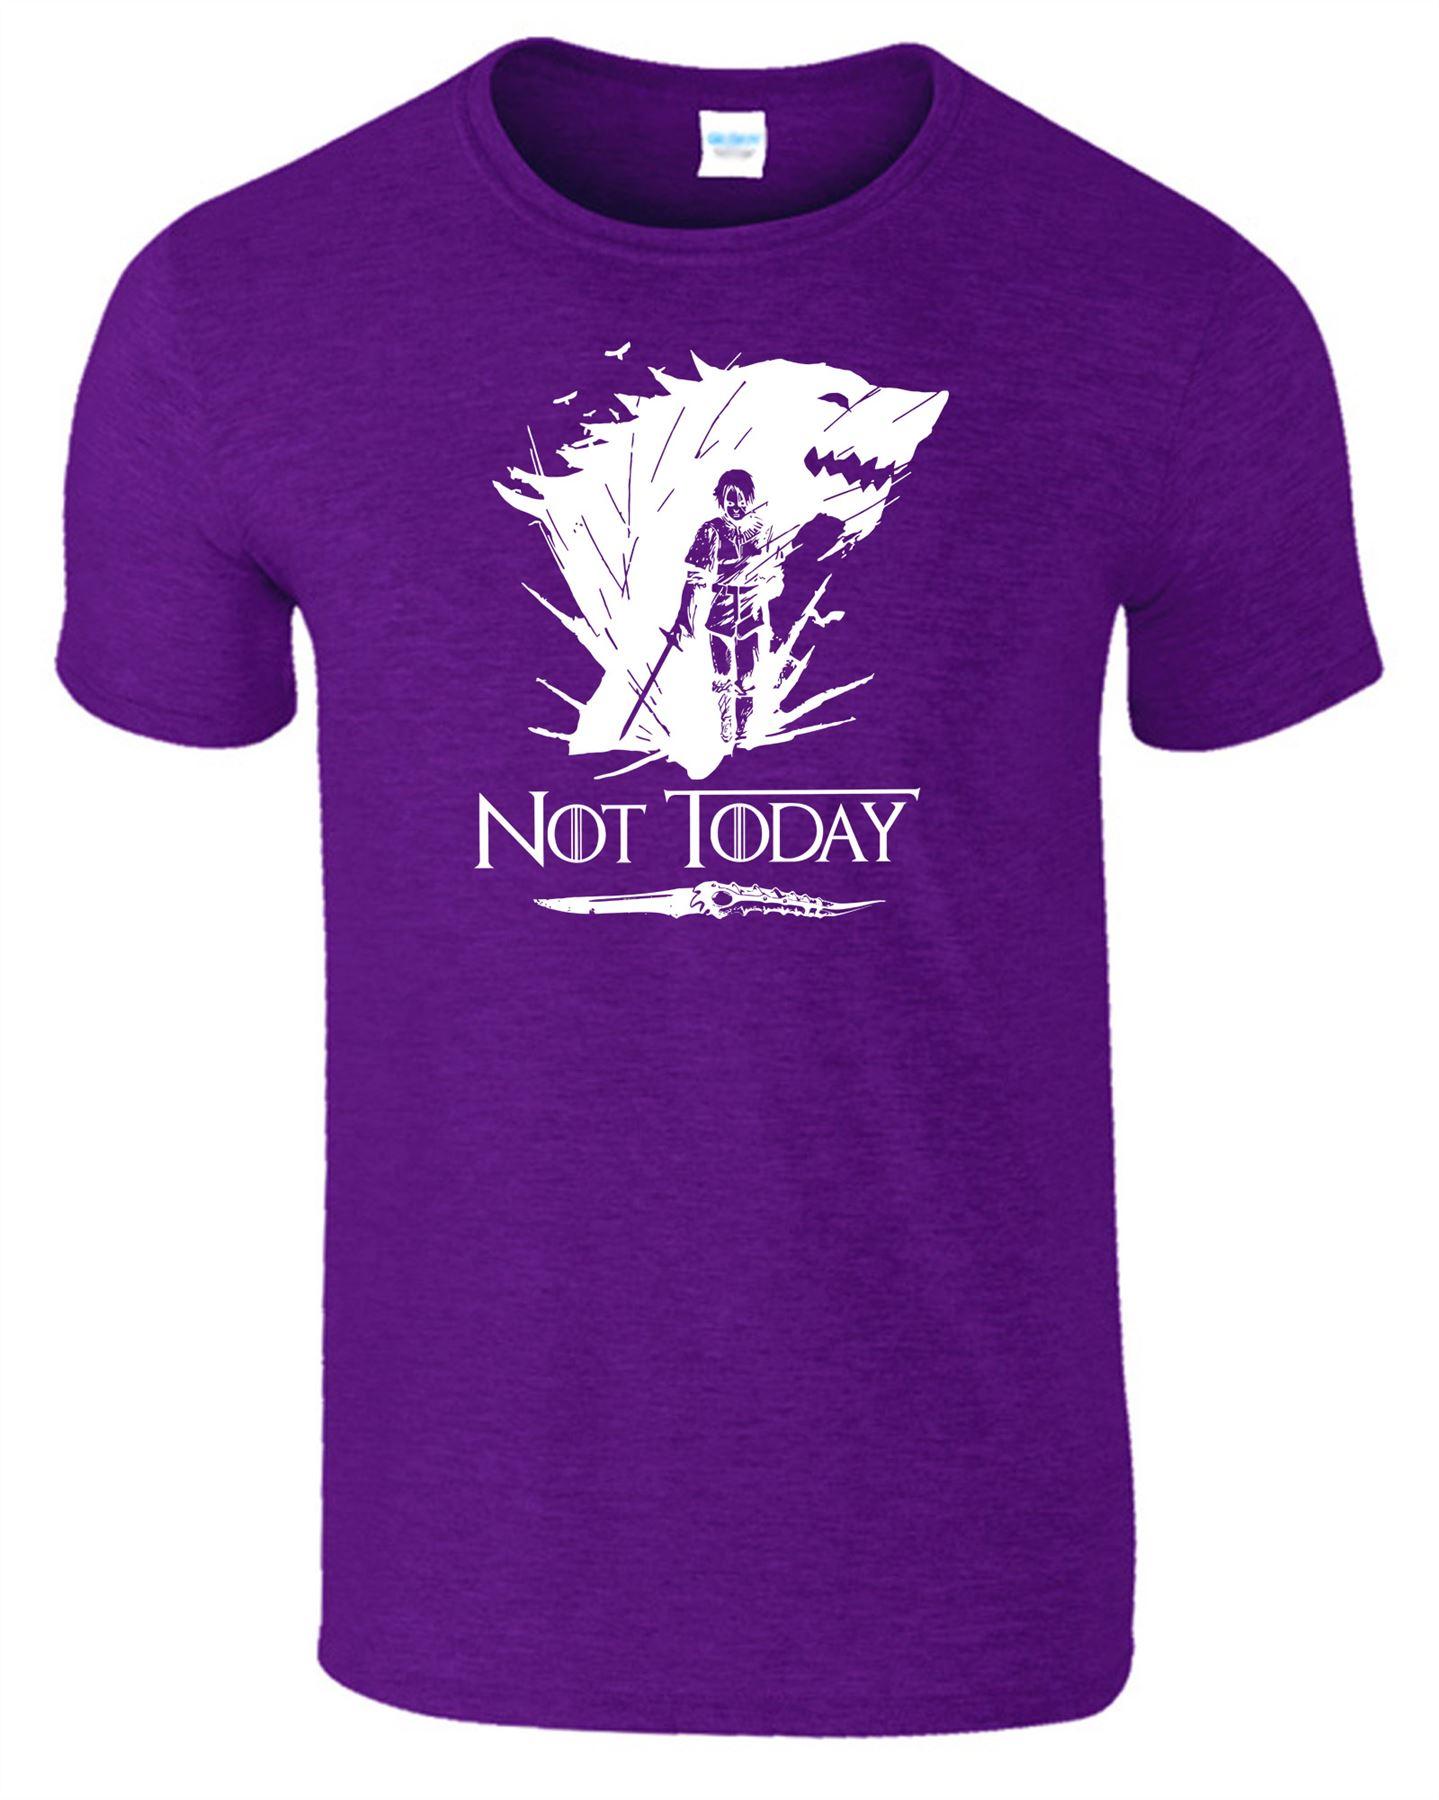 Arya-Stark-Not-Today-T-Shirt-Mens-Game-Season-Womens-Shirt-Adults-Unisex-Fit Indexbild 19